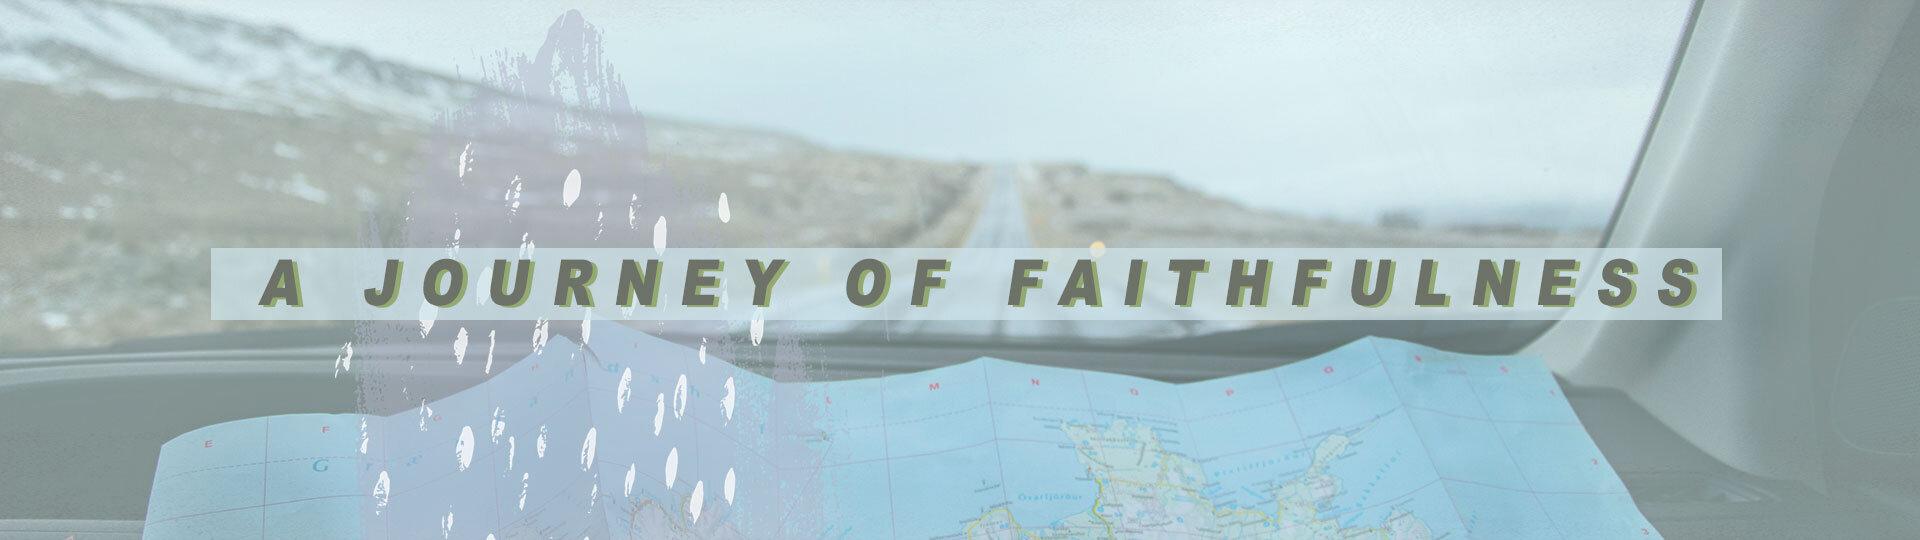 a-journey-of-faithfulness_blogseries.jpg